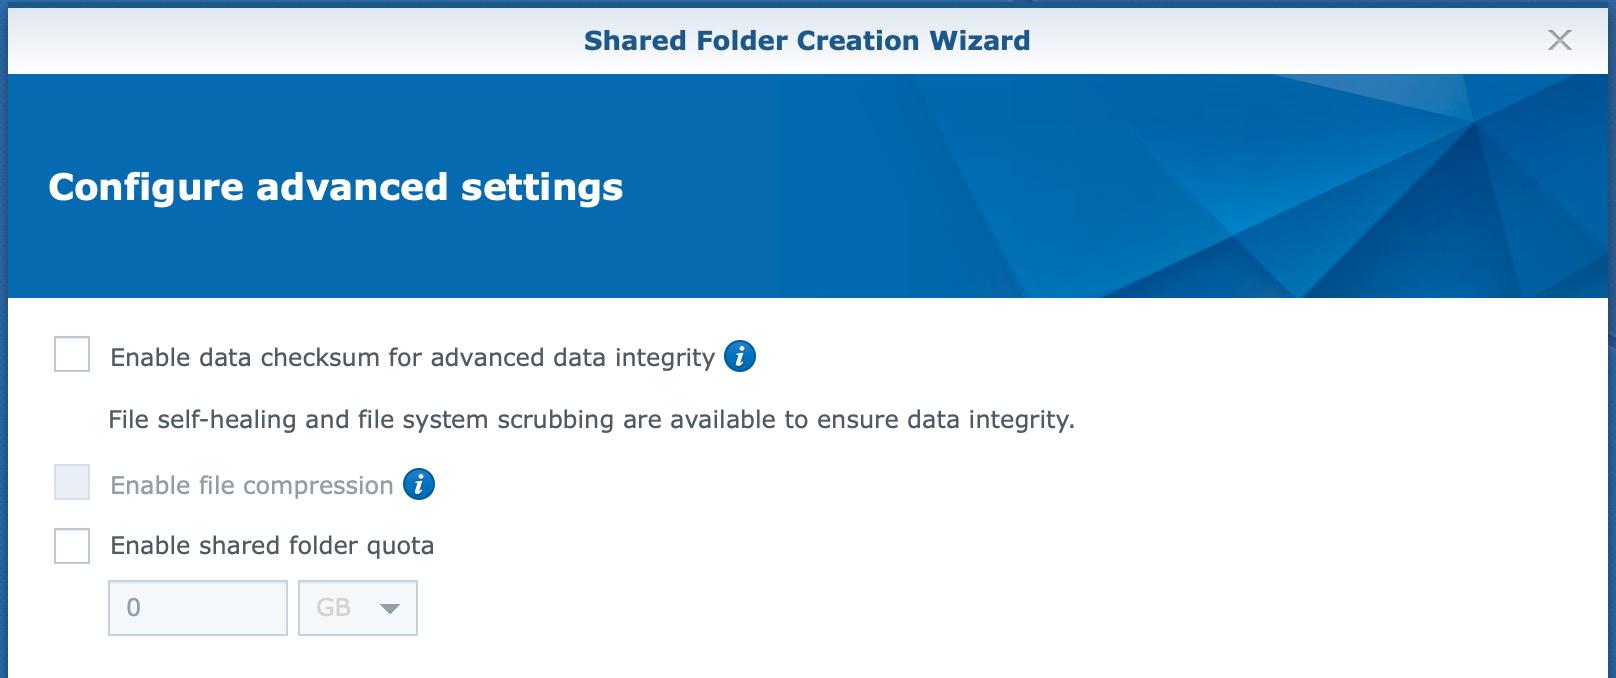 synology, shared folder, create wizard, dsm6